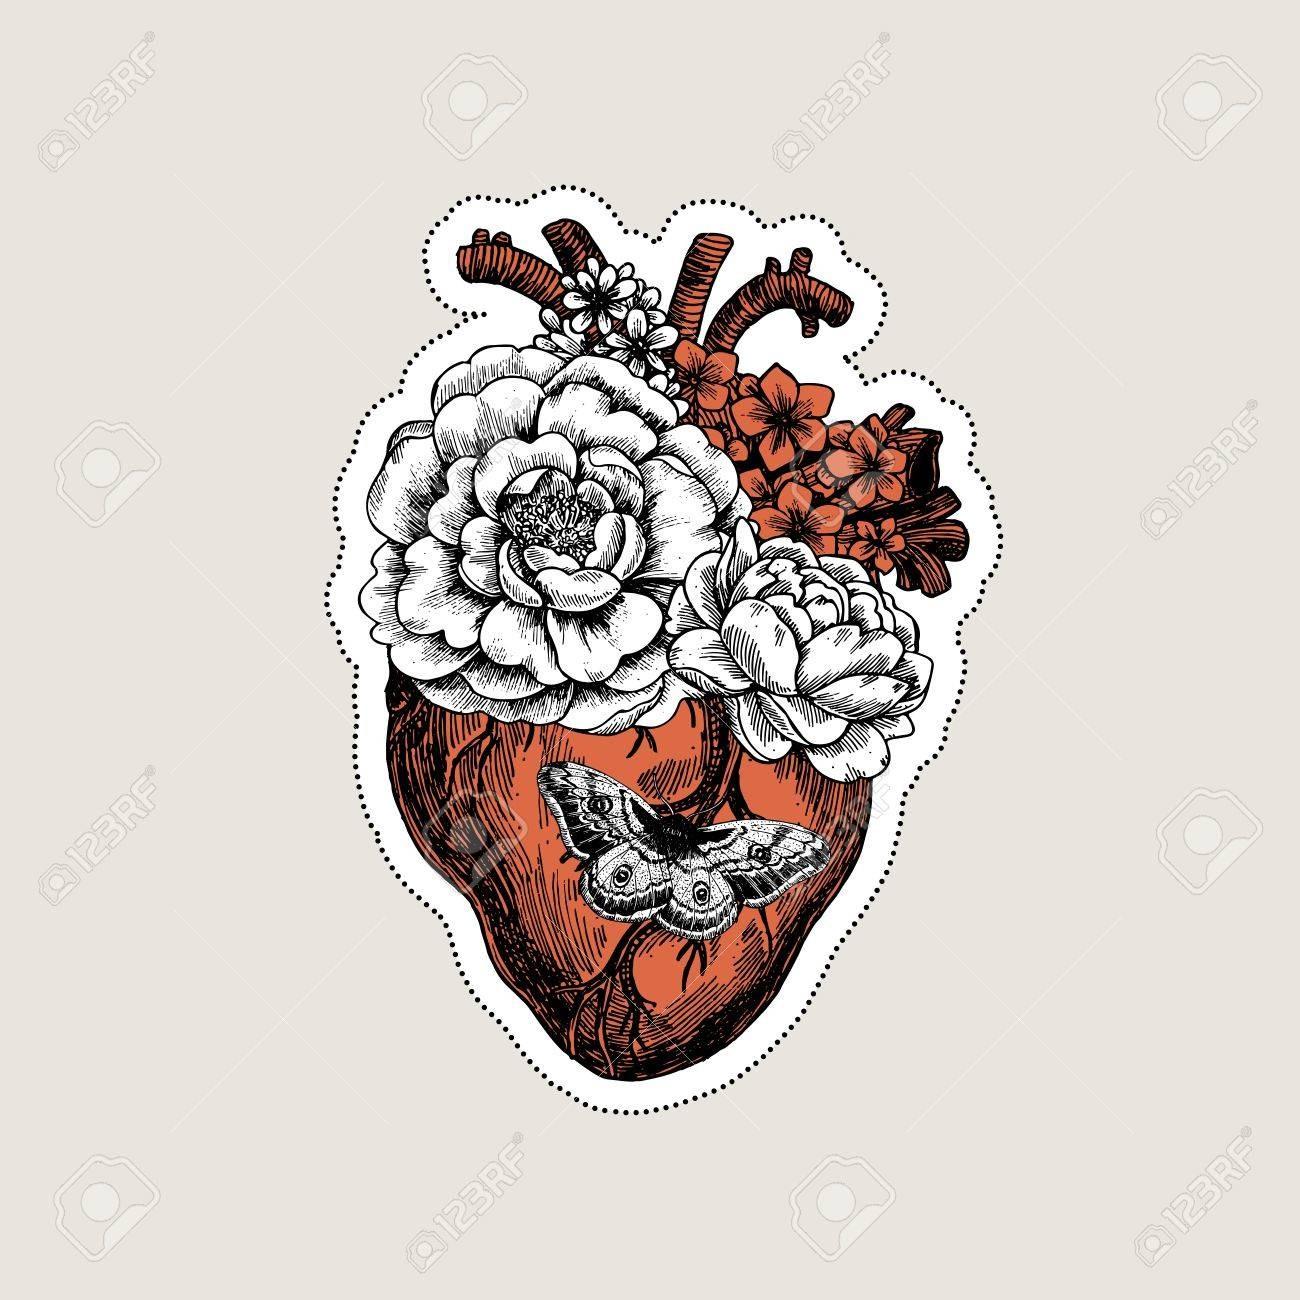 1300x1300 87516195 Tattoo Anatomy Vintage Illustration Floral Anatomical